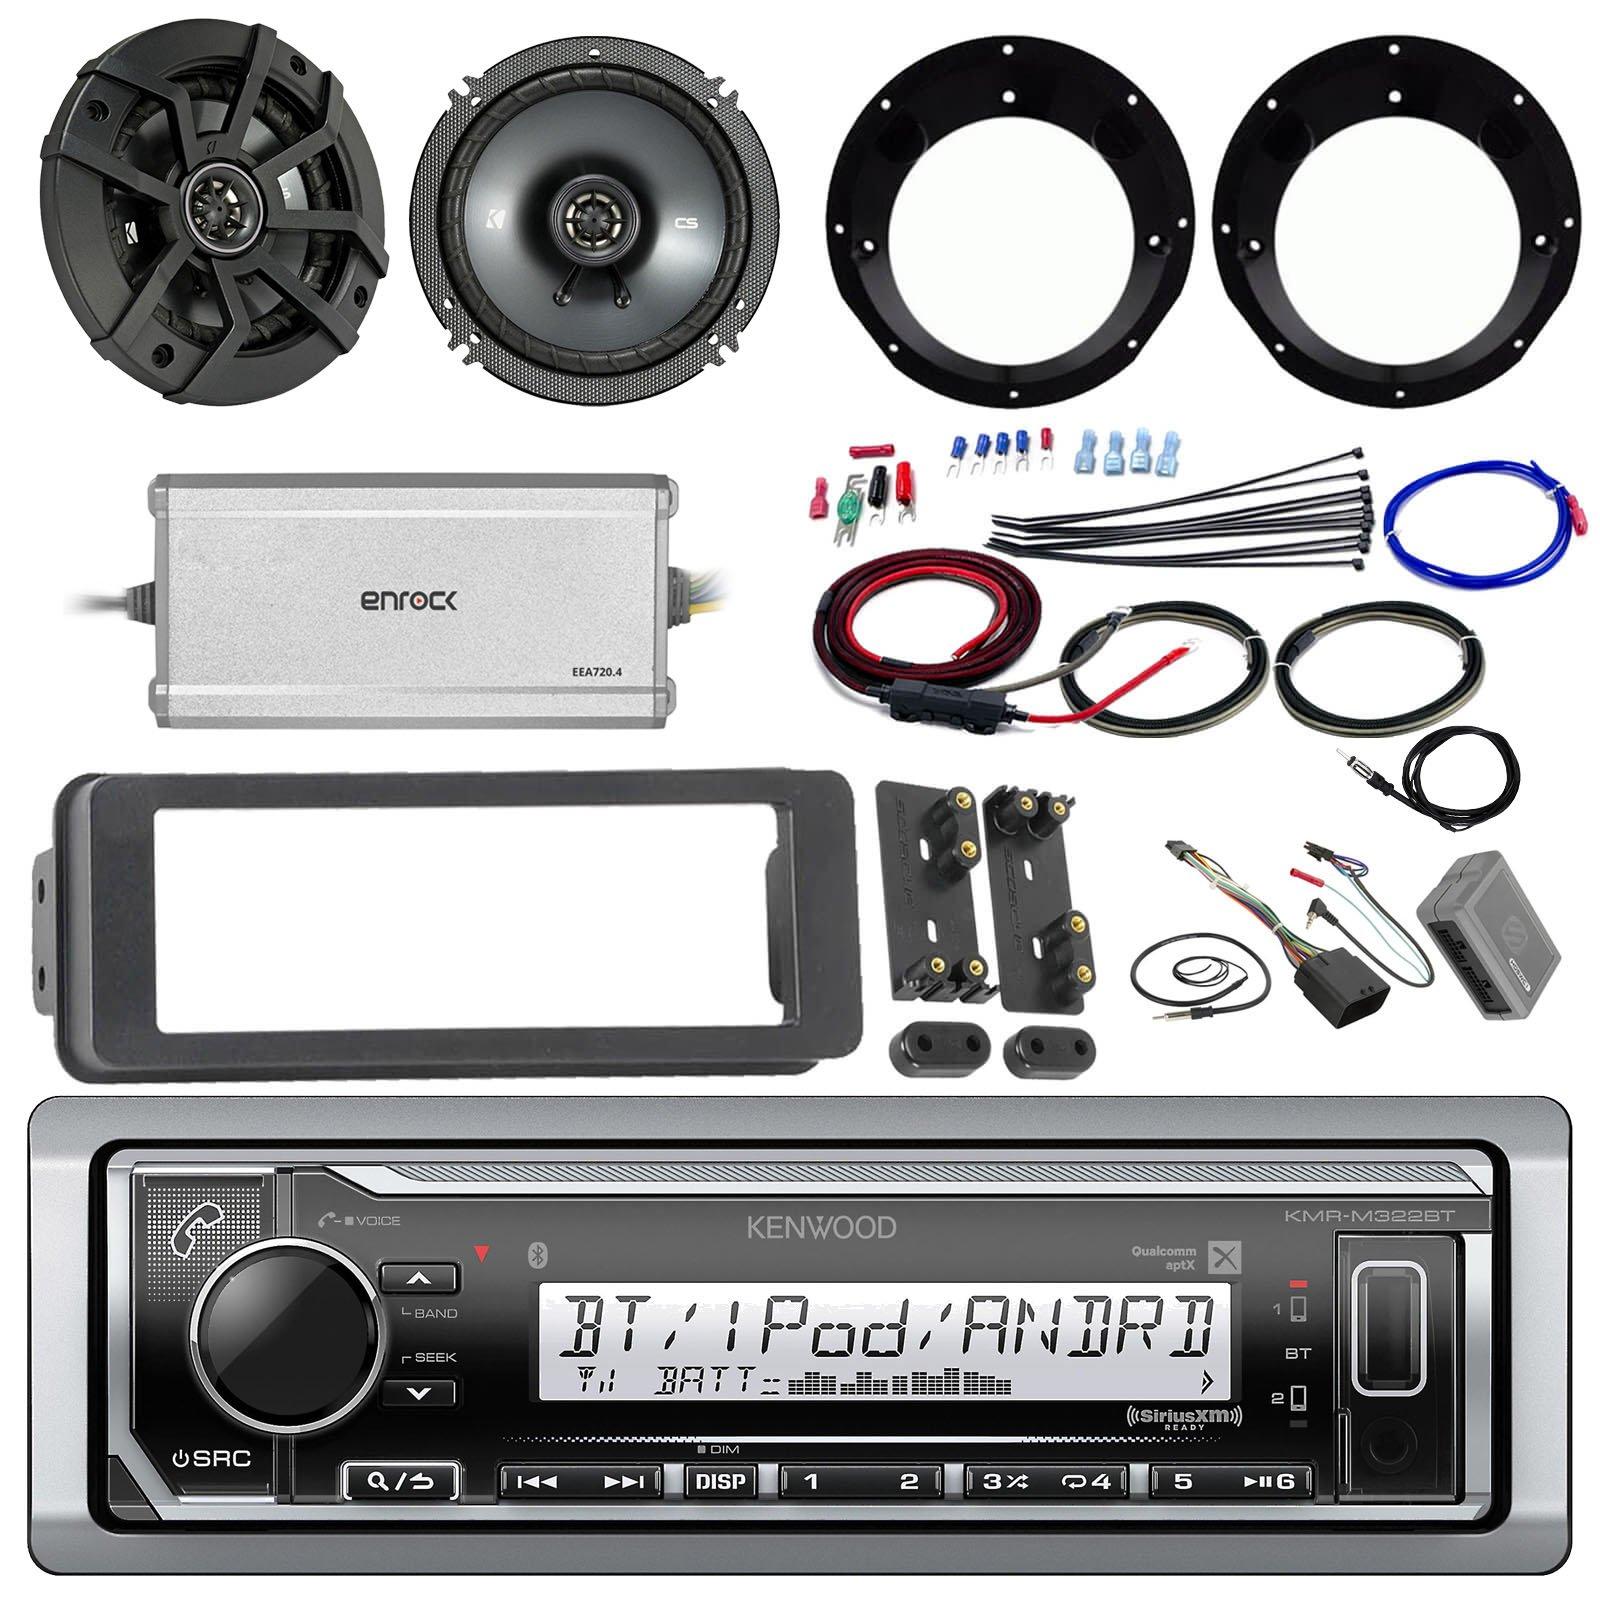 Kenwood KMR-M315BT Stereo Receiver Bundle W/ 2 Kicker 6.5'' Speaker W/ Motorcycle Speaker Adapters + Class D Amplifier W/ Amp Kit + Dash Trim Kit W/ Handle Bar Conroller + Enrock Antenna